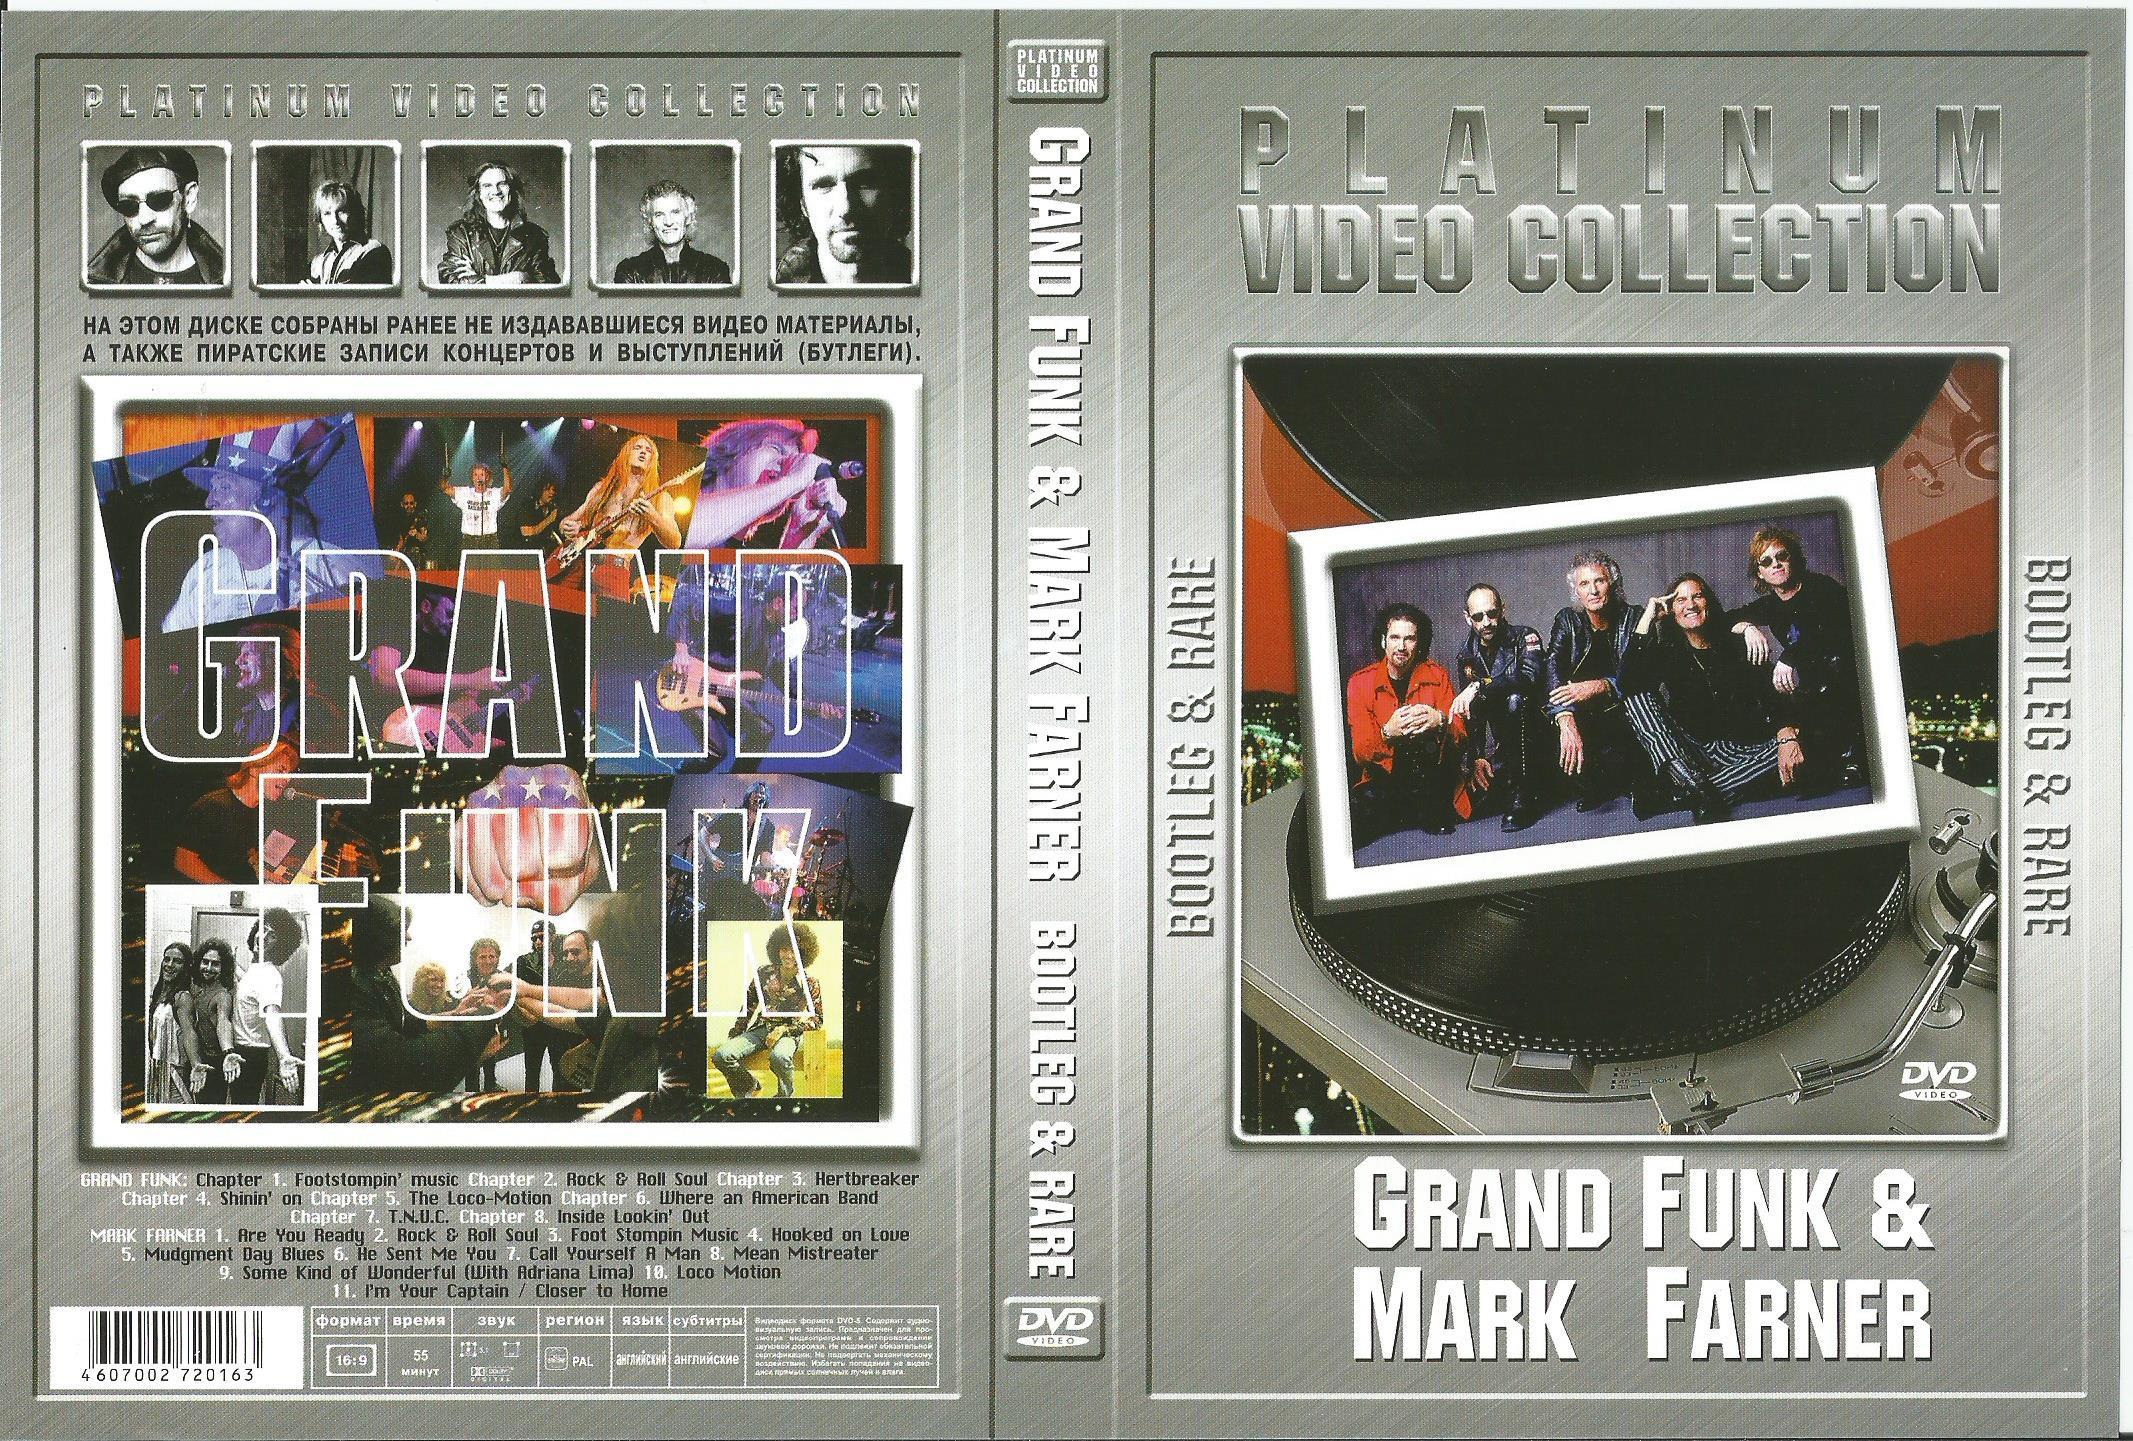 Platinum Video Collection